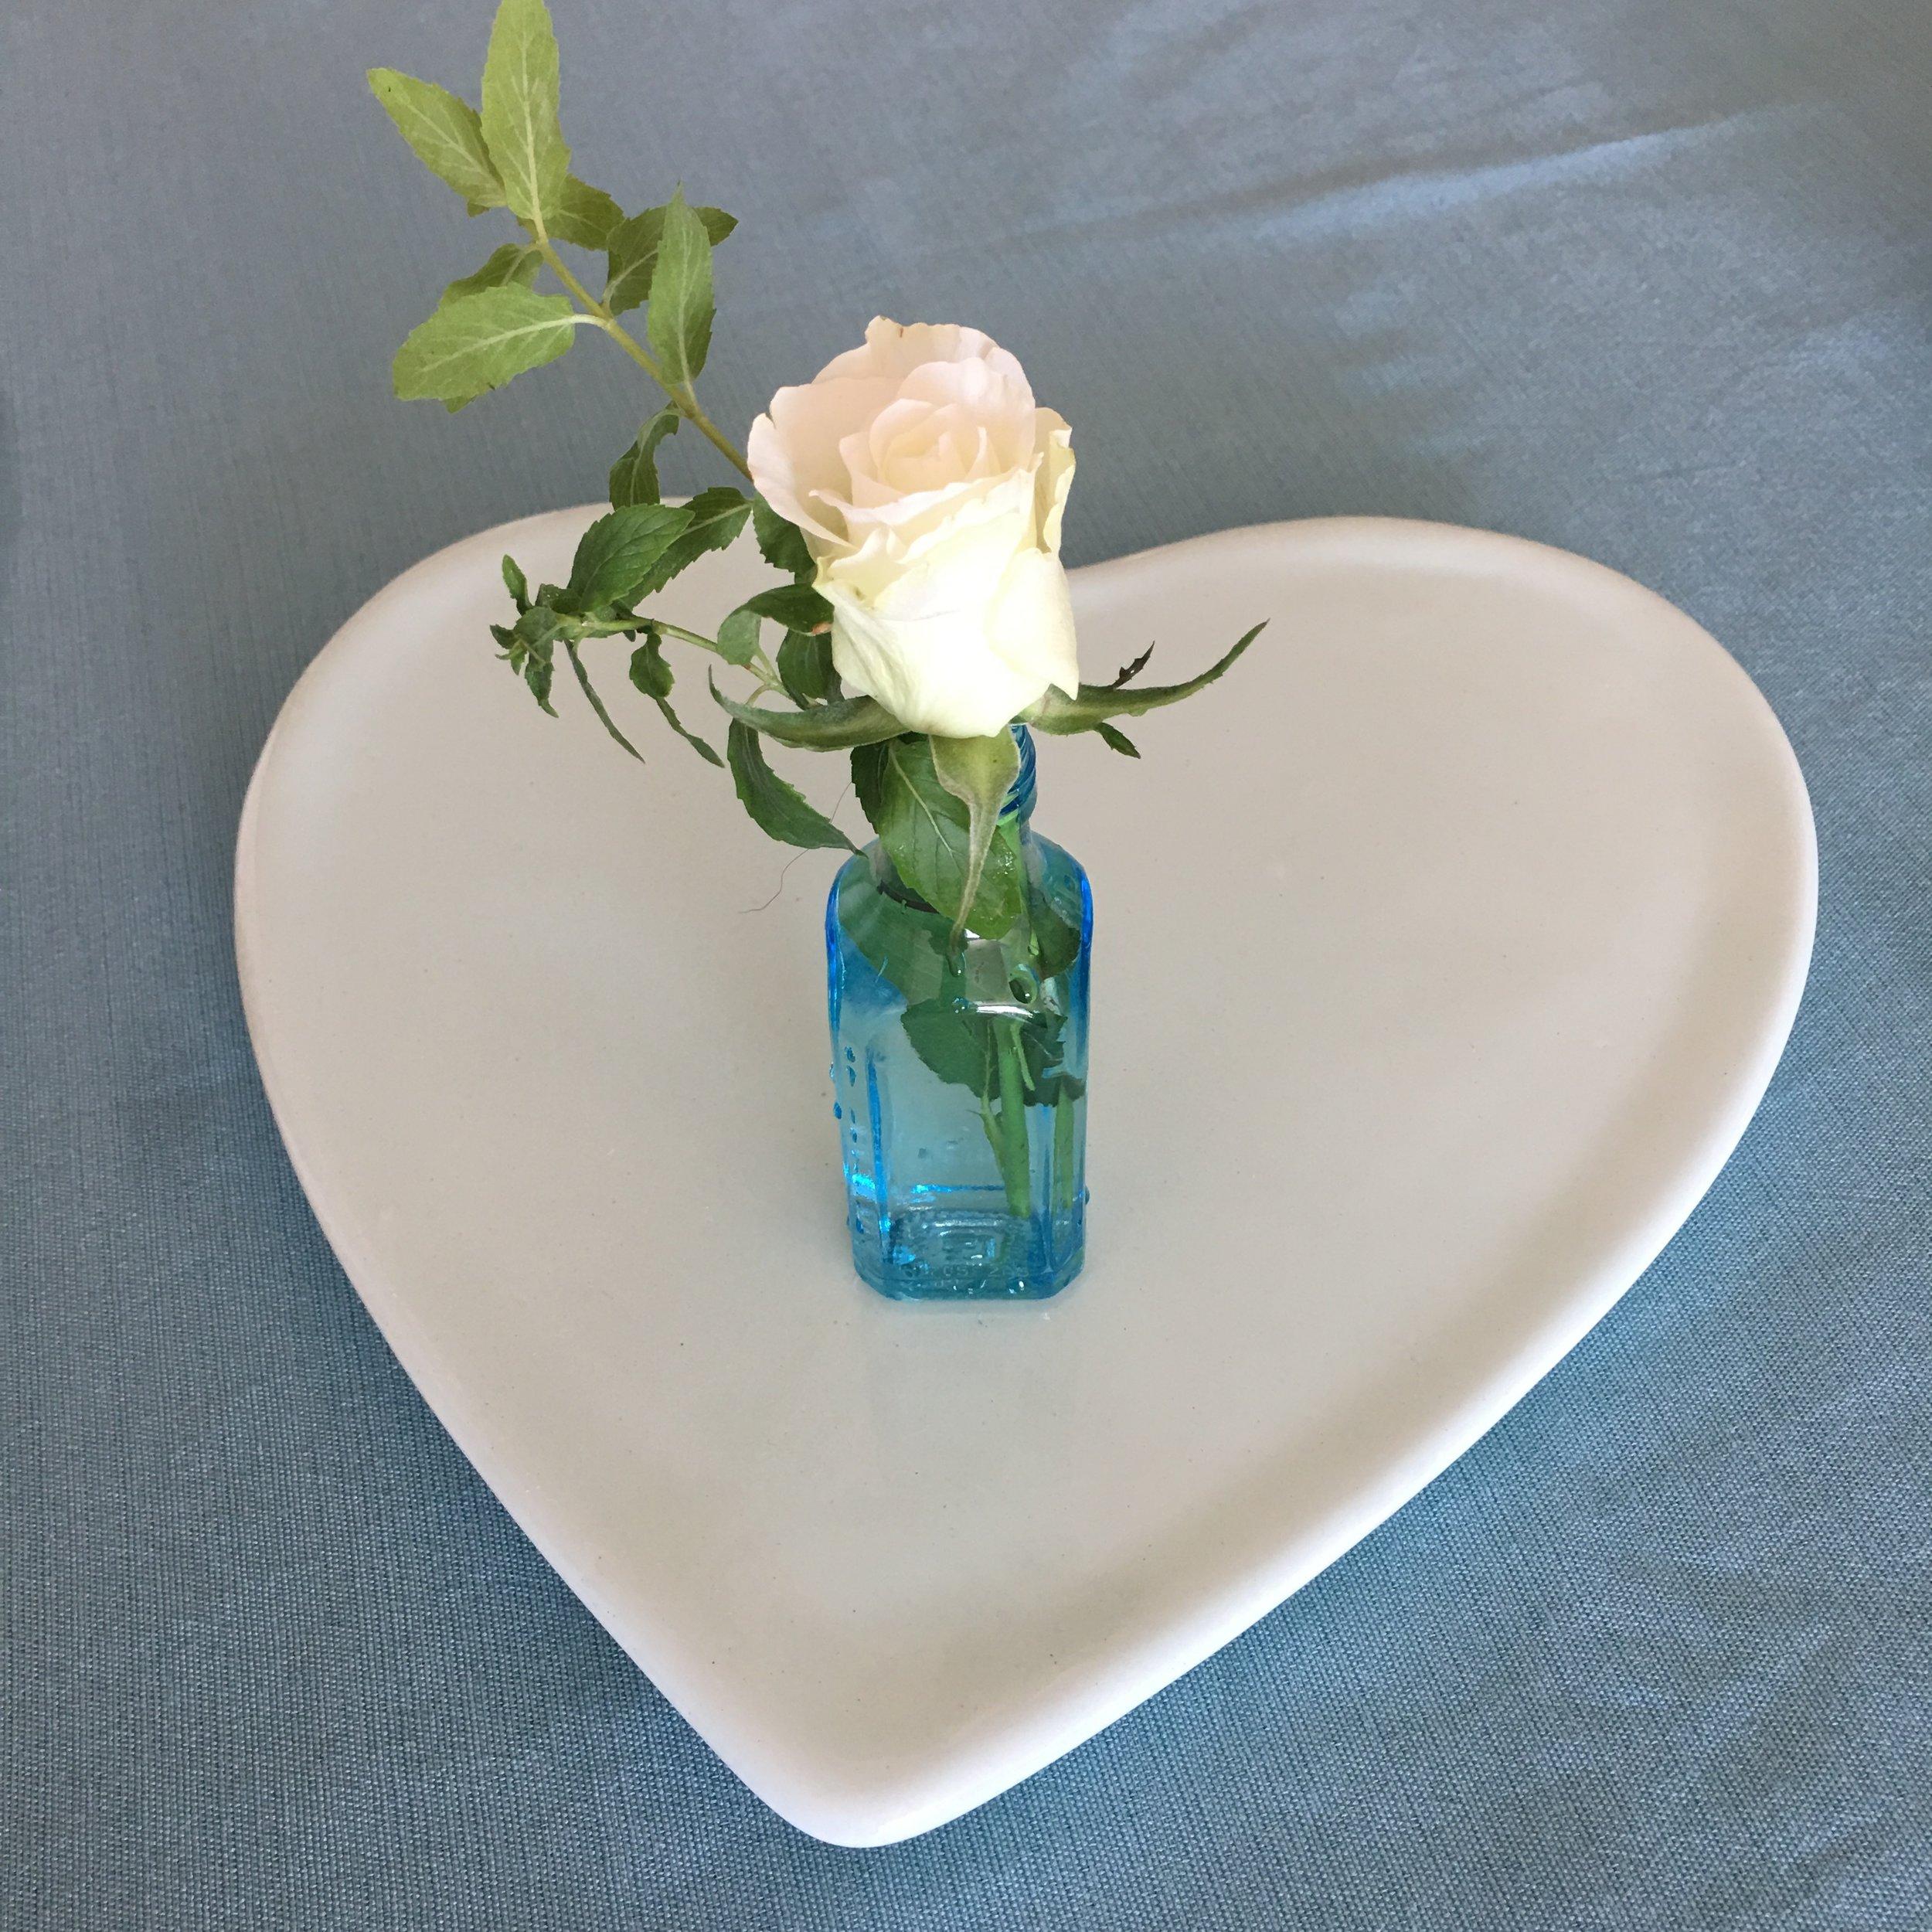 Heart and rose arrangement